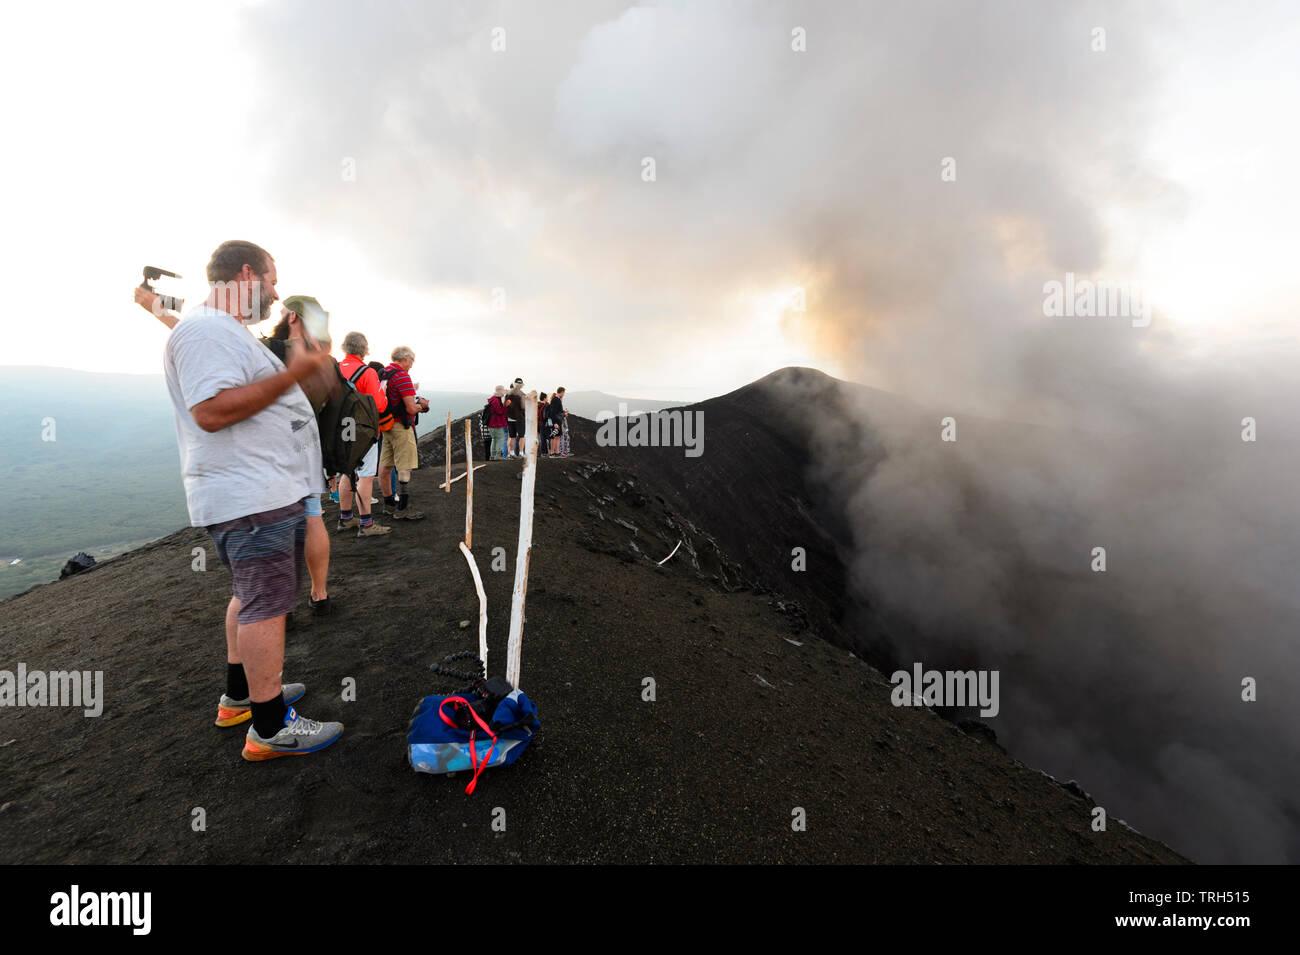 Tourists standing on the rim of erupting Mt Yasur Volcano at sunset, Tanna Island, Vanuatu - Stock Image